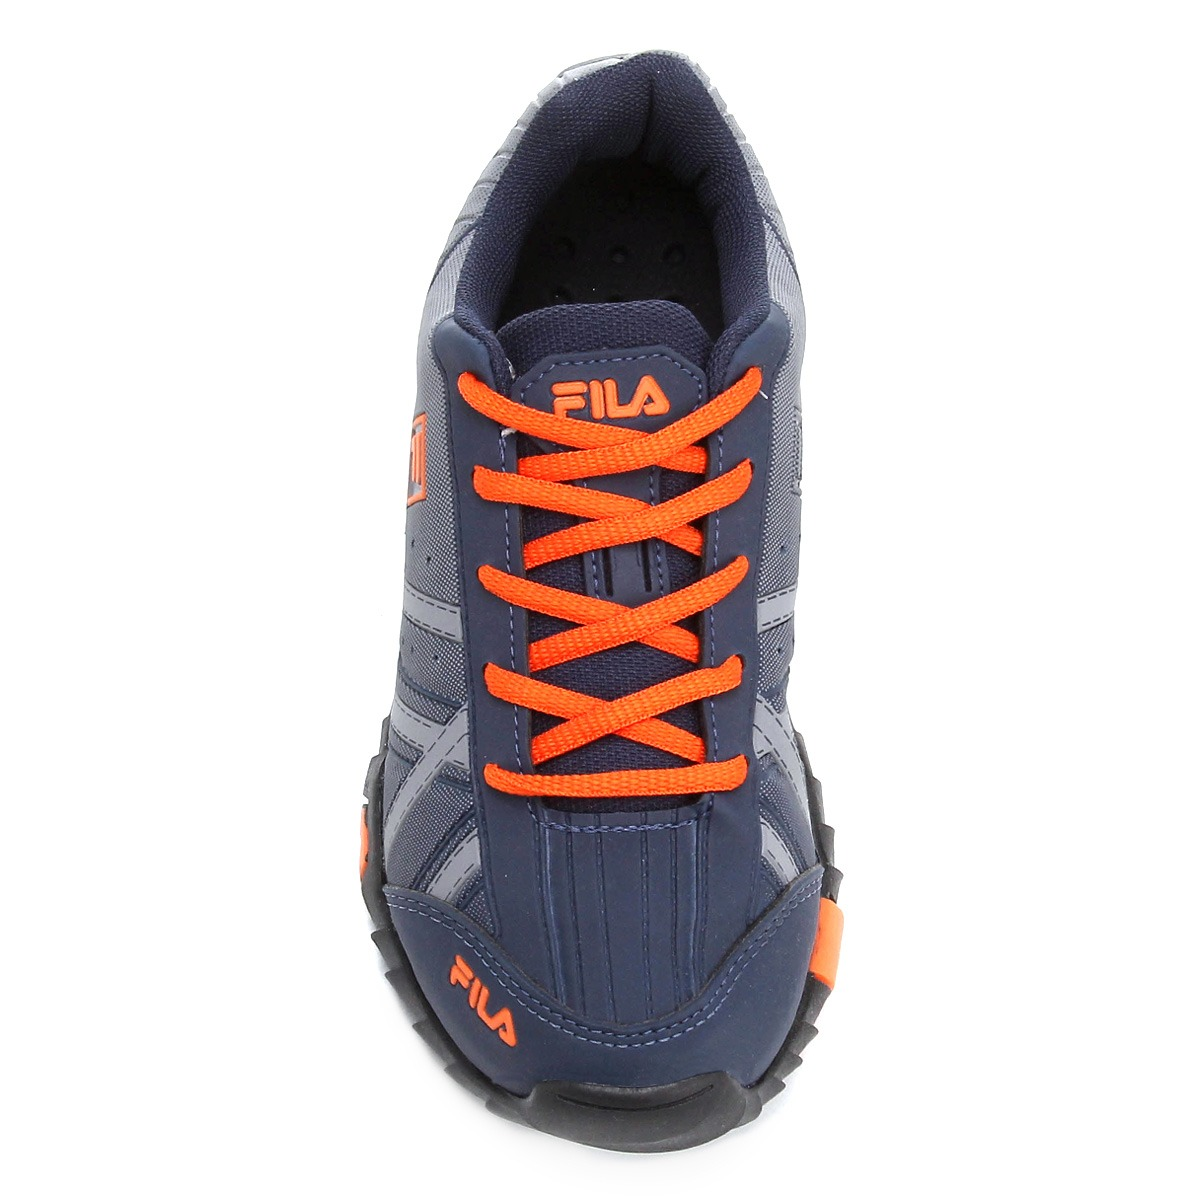 tênis fila slant summer azul laranja masculino infantil. Carregando zoom. 619e3a7c629